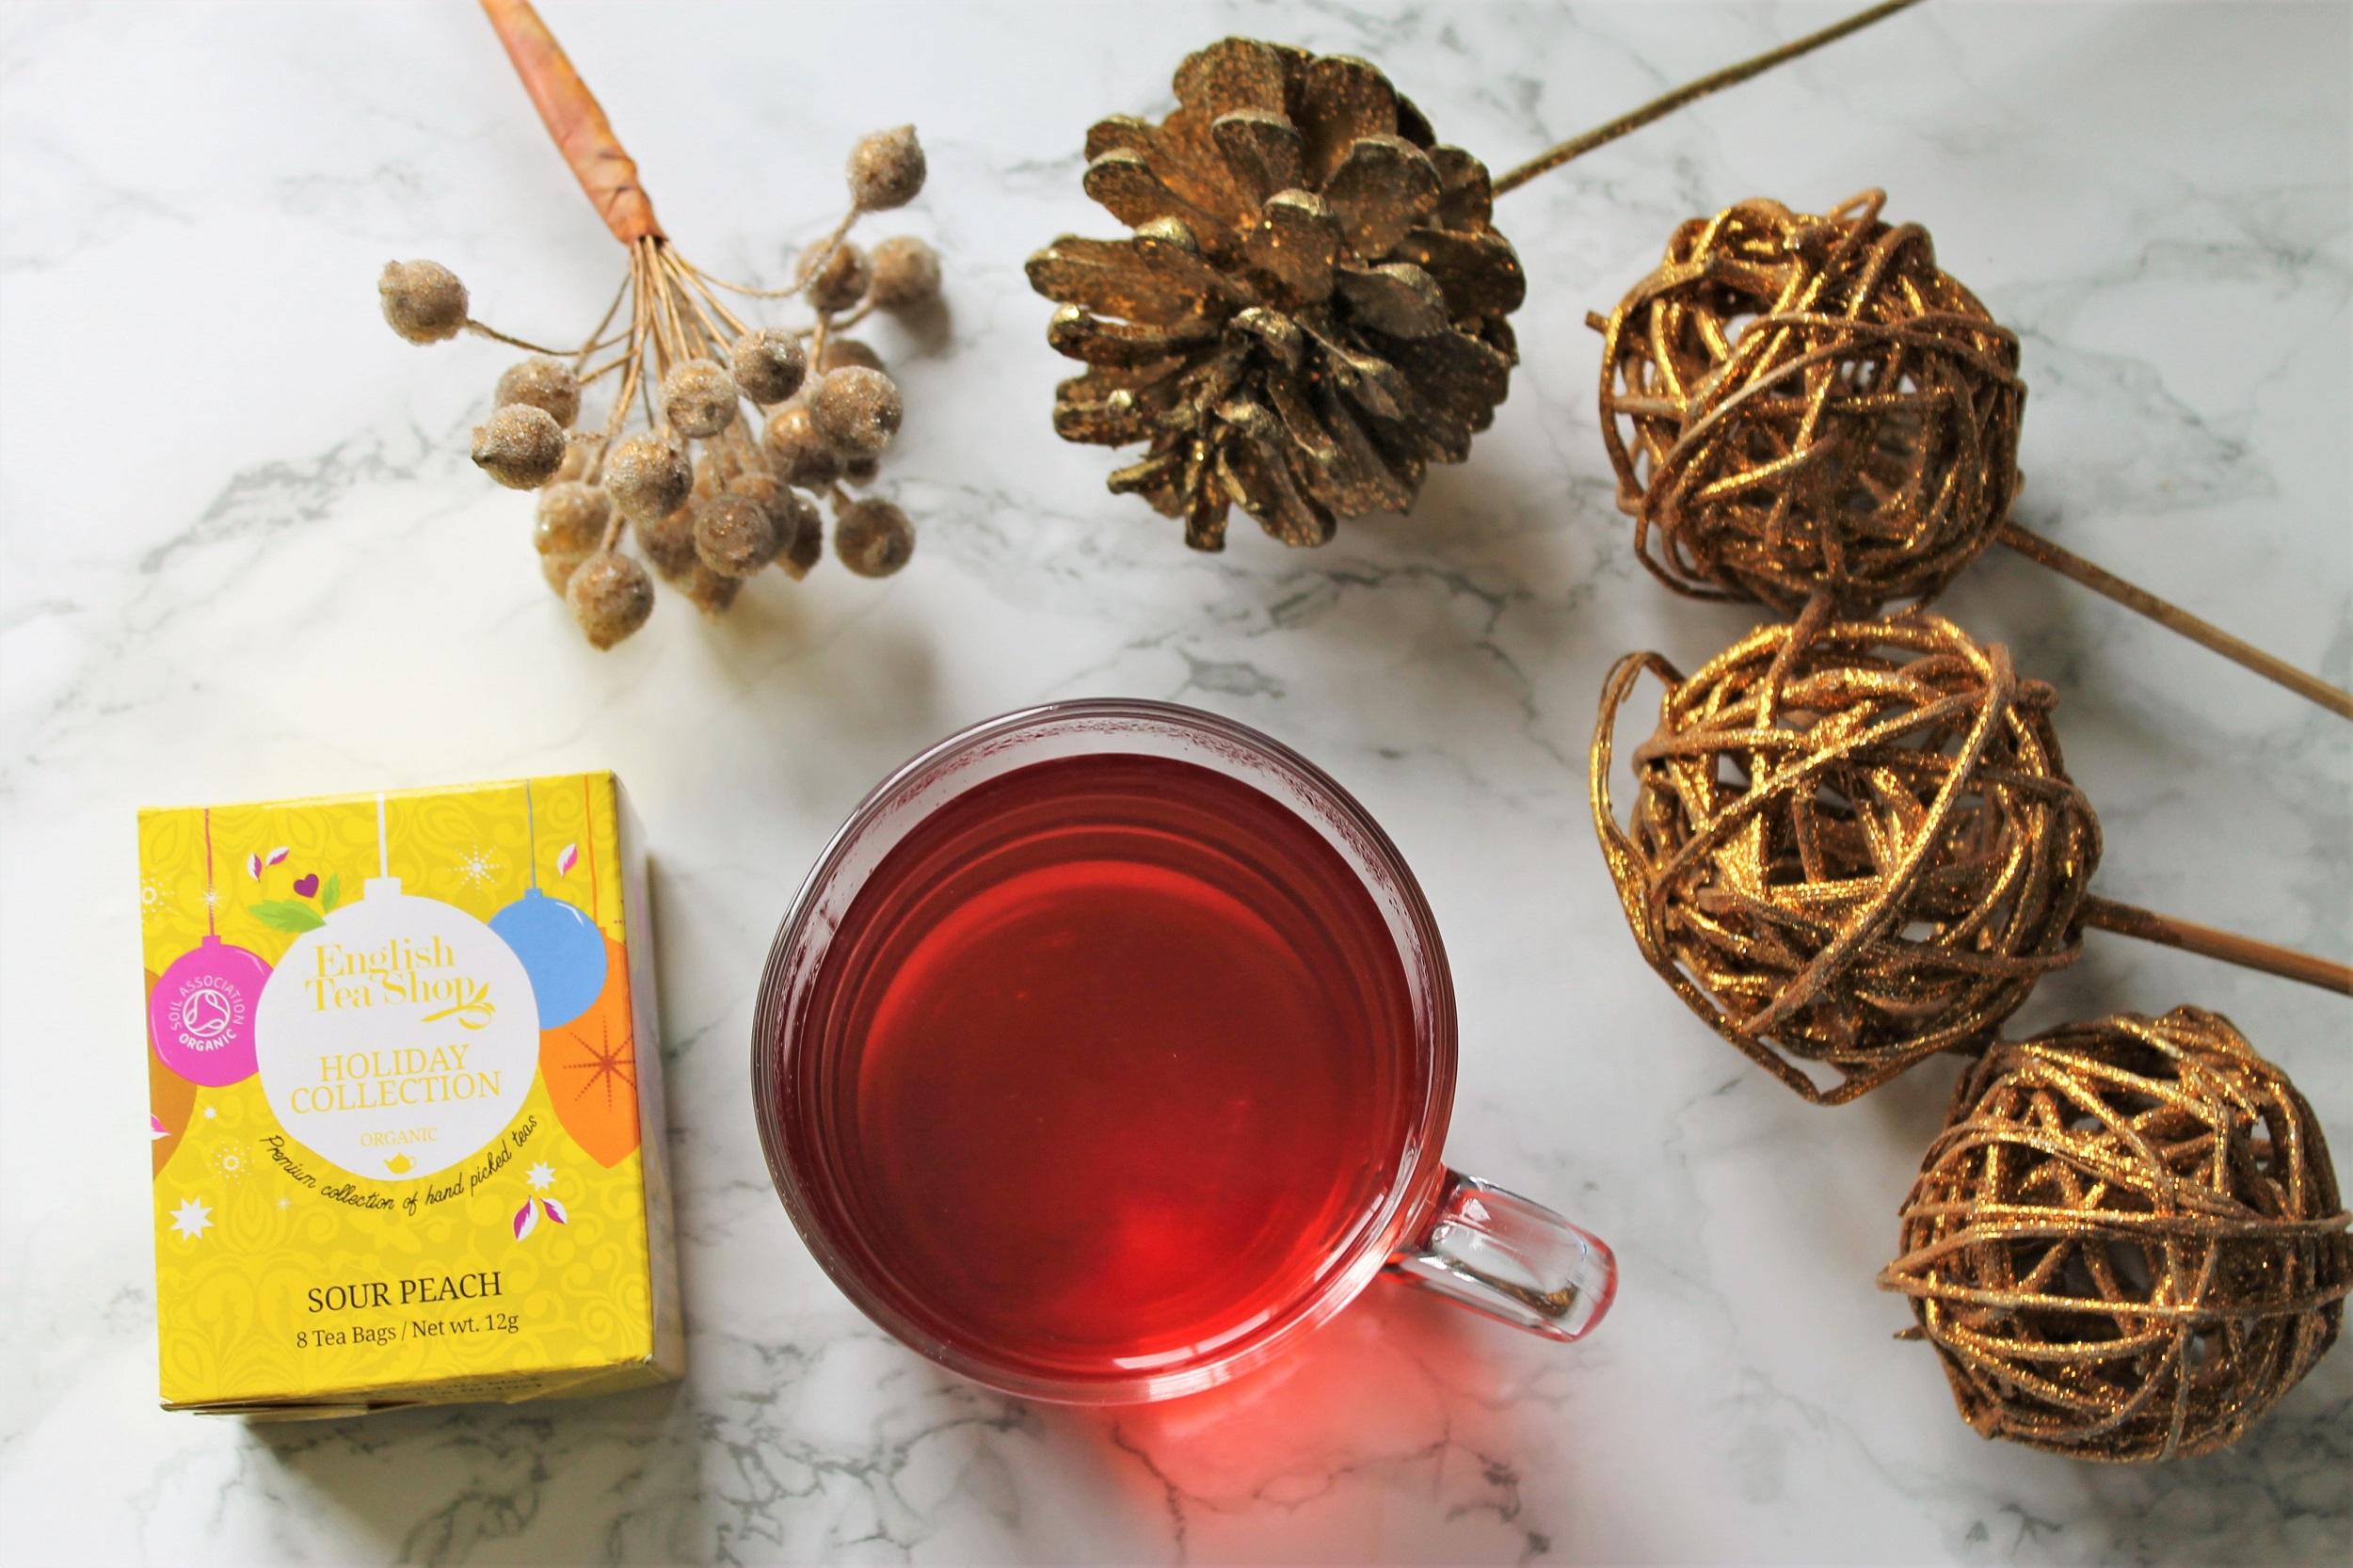 English Tea Shop Sour Peach Tea Review